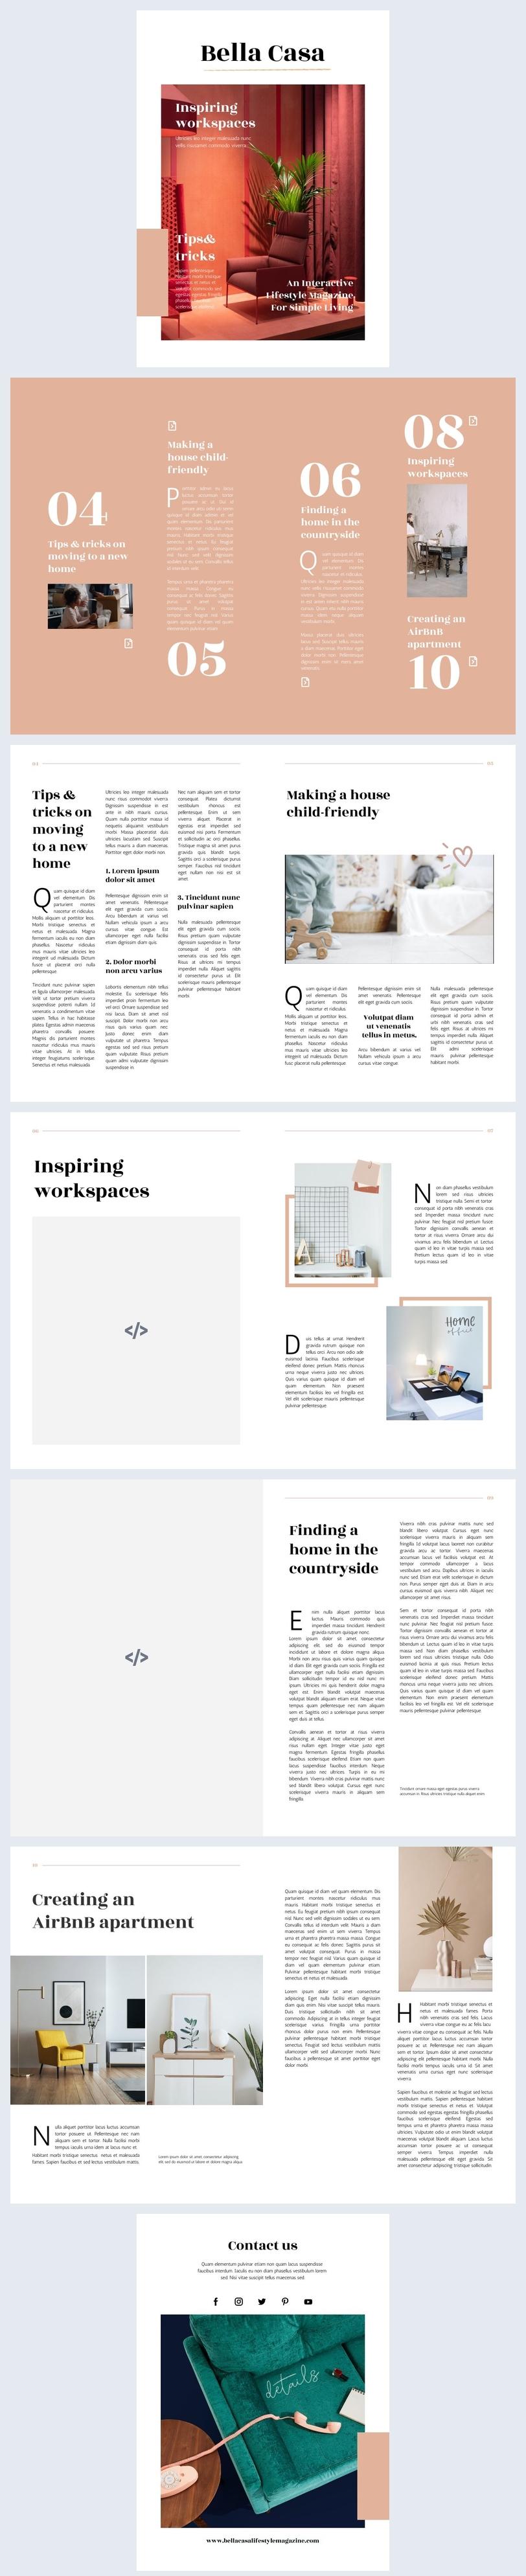 Interactive Lifestyle Magazine Design Sample